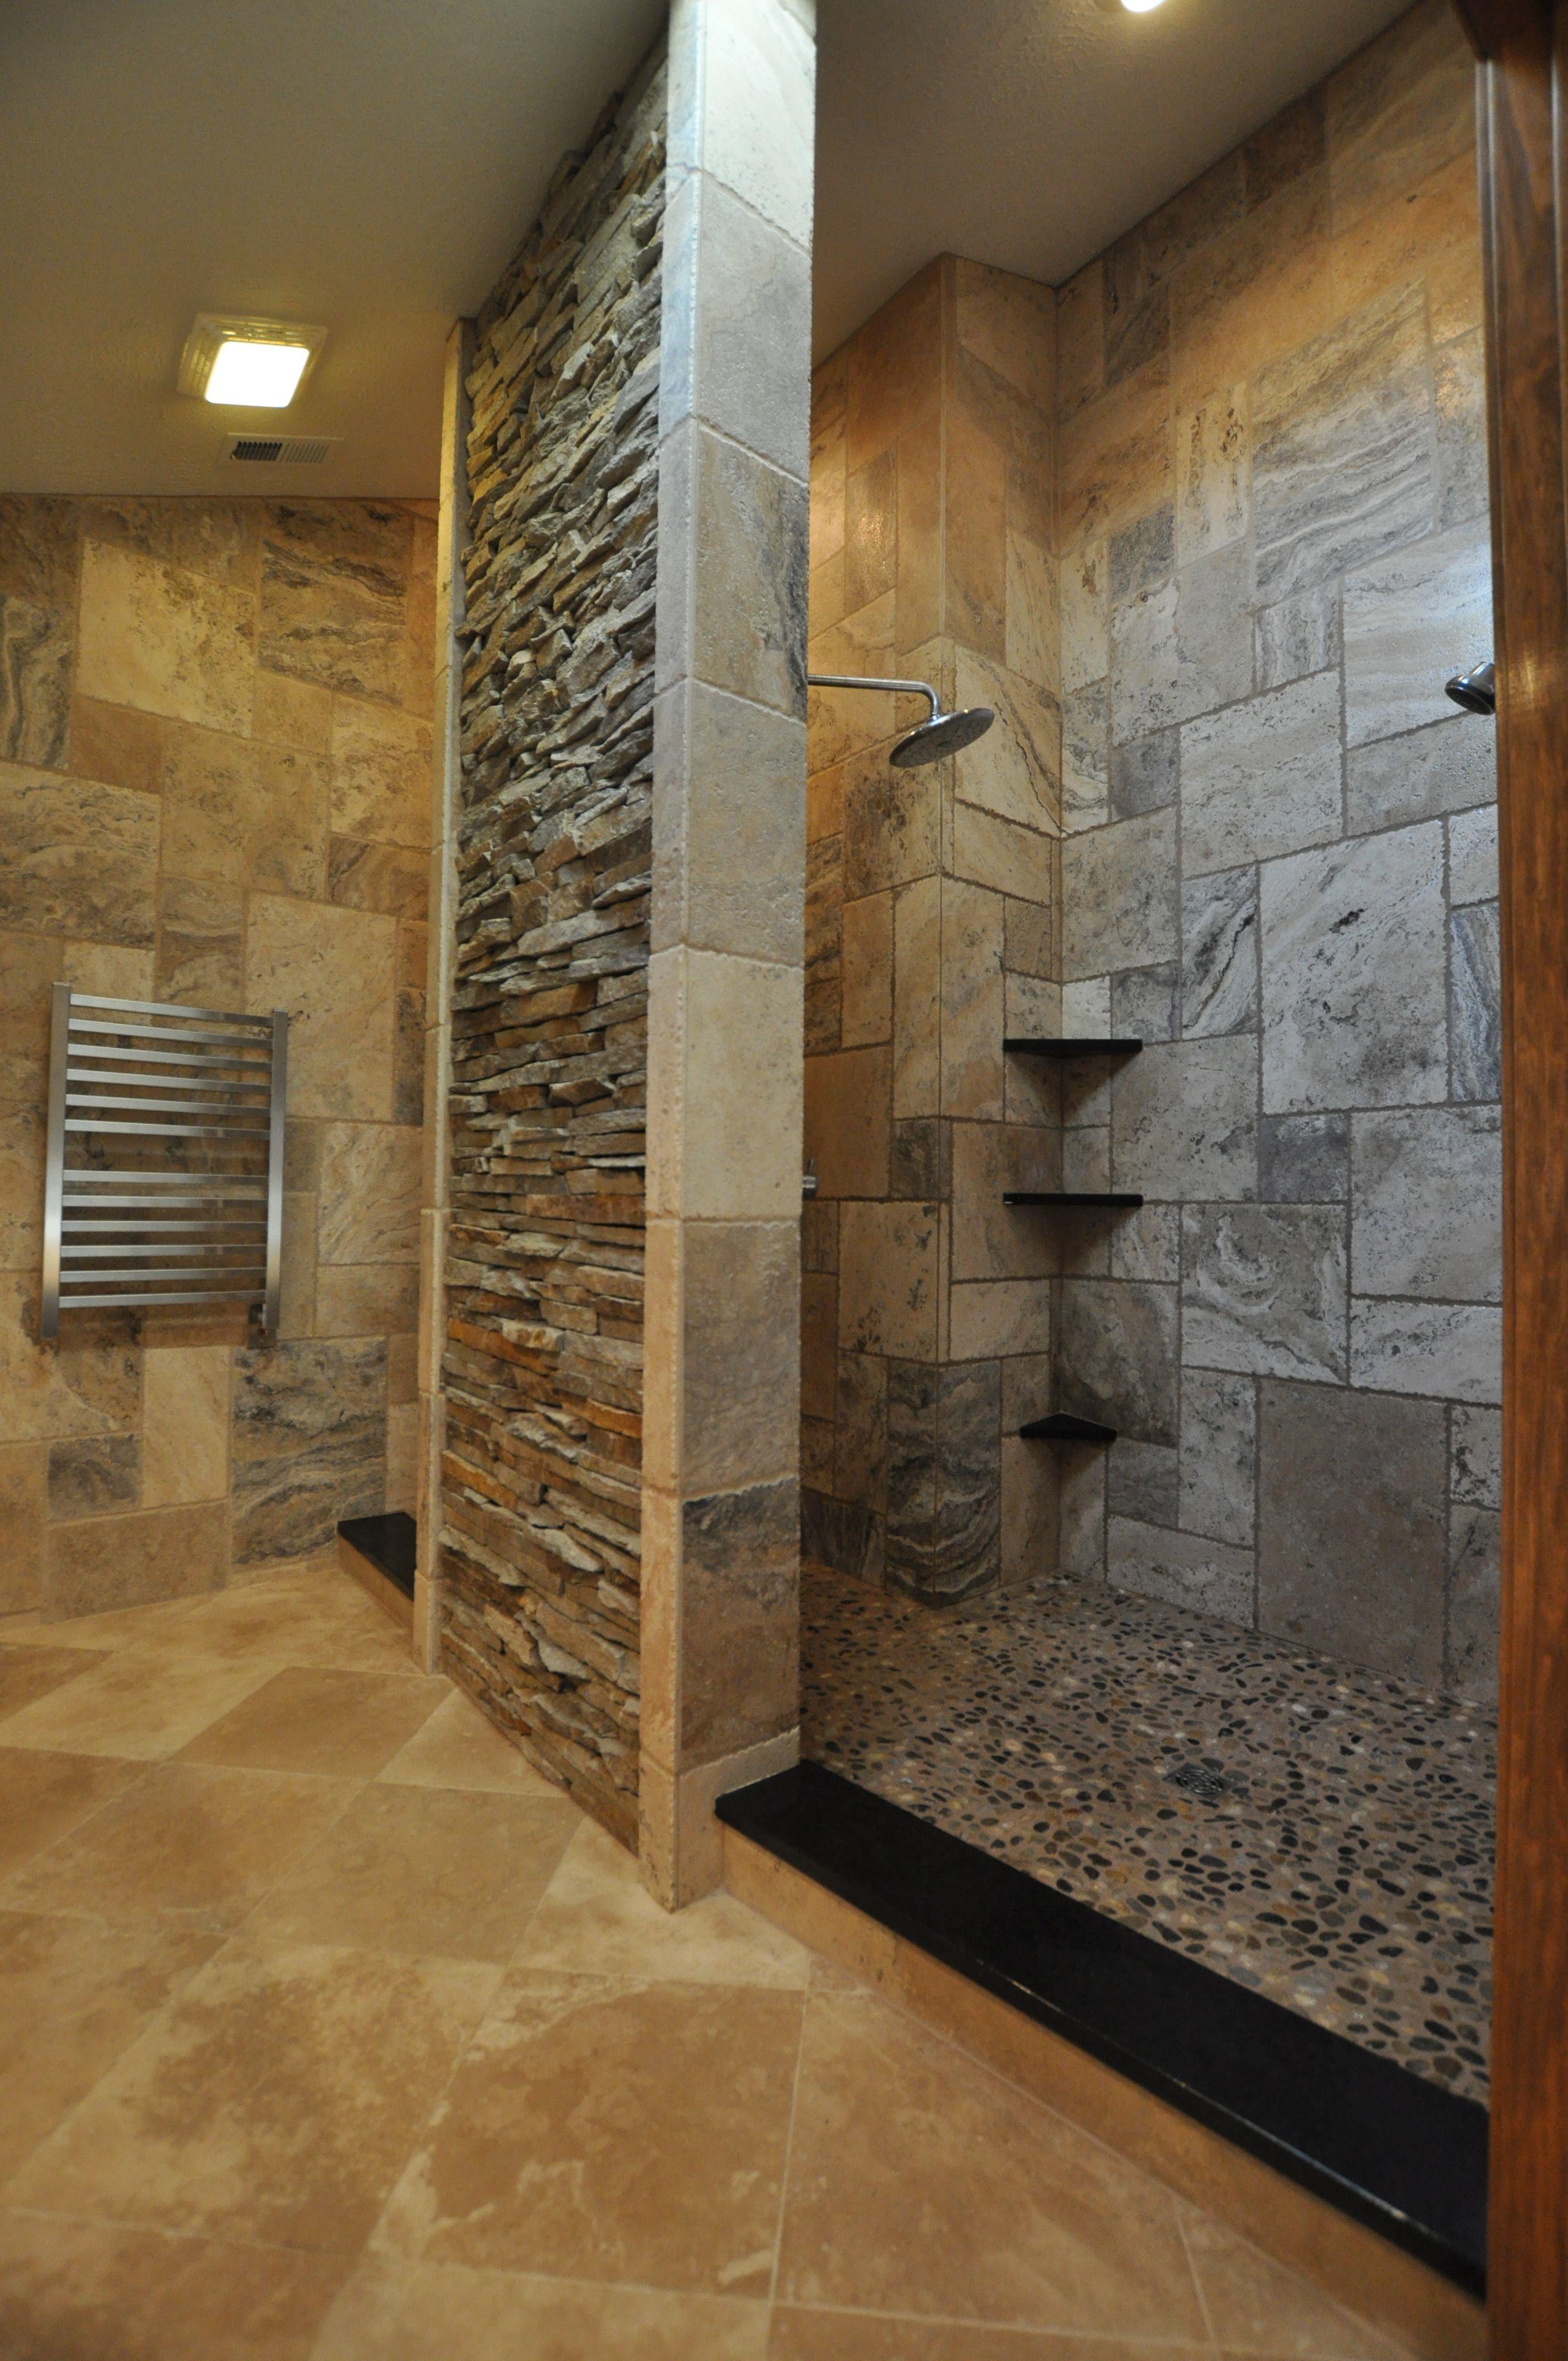 Exquisite News Bathroom Shower Tile Ideas On Bathroom Design Tile Showers Ideas Doorless Shower Design Small Bathroom Inspiration Contemporary Small Bathrooms